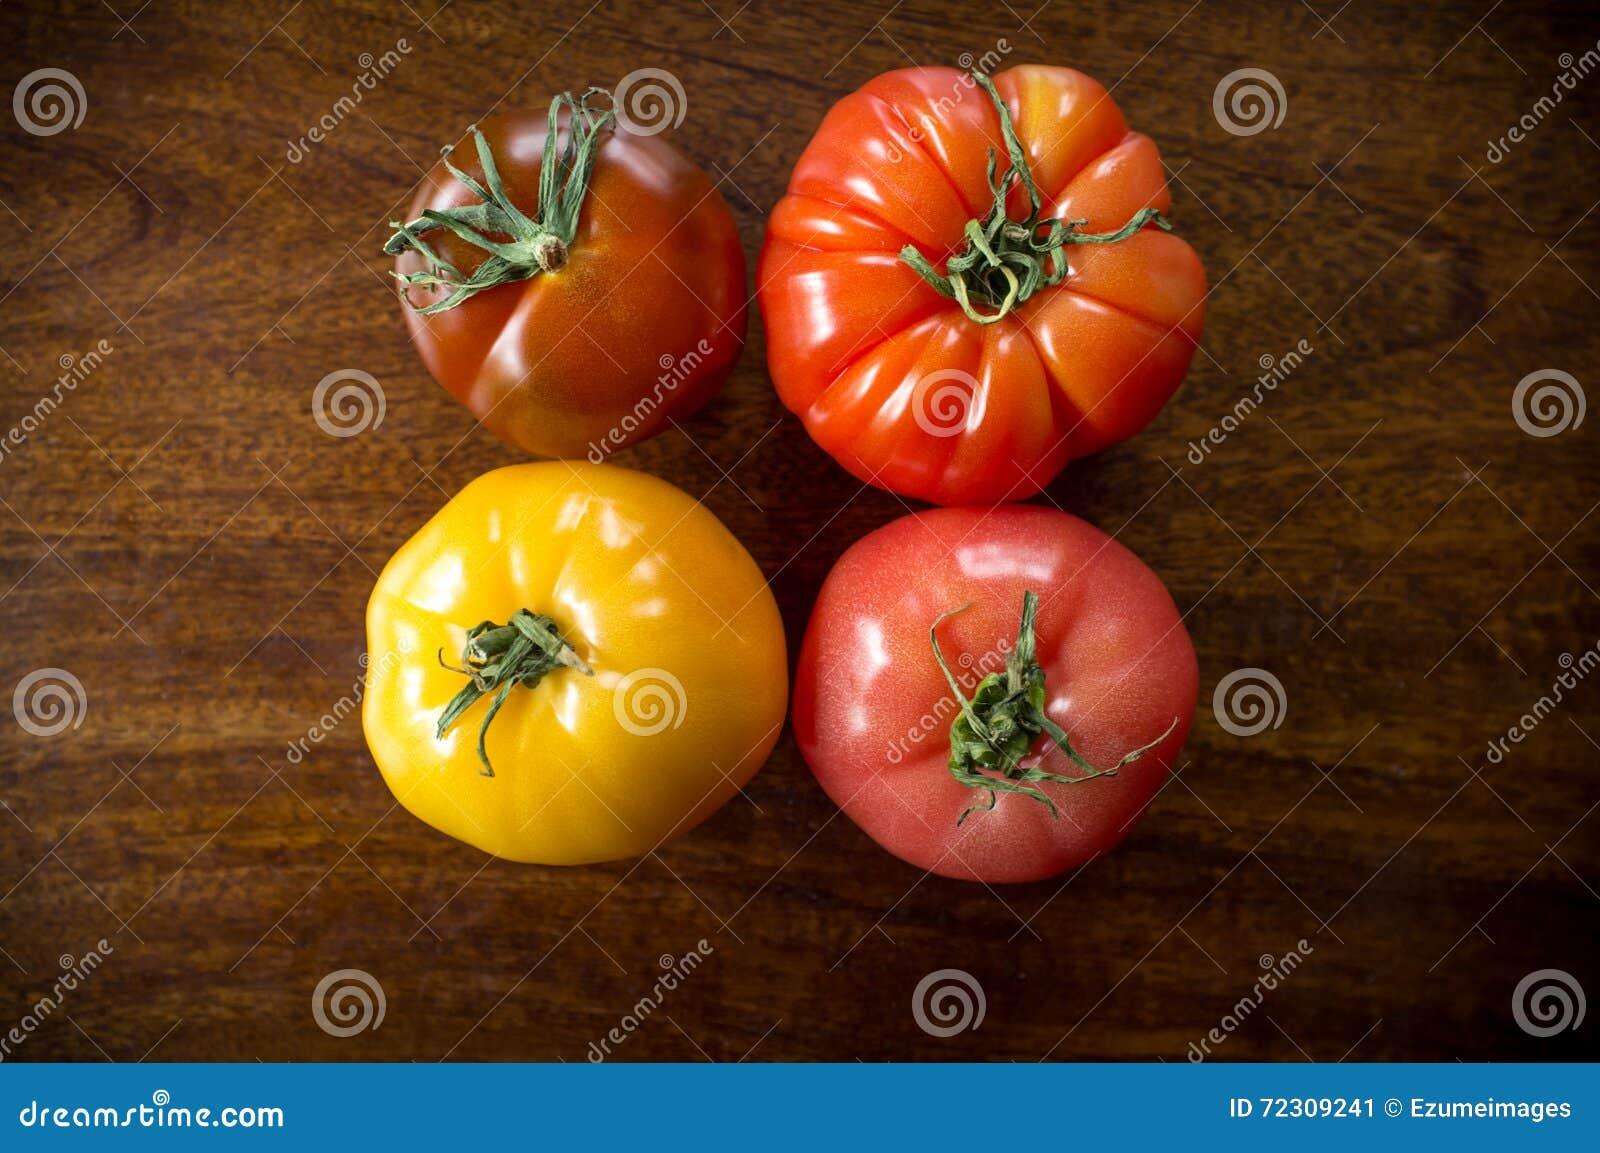 Variety Heirloom Tomatoes